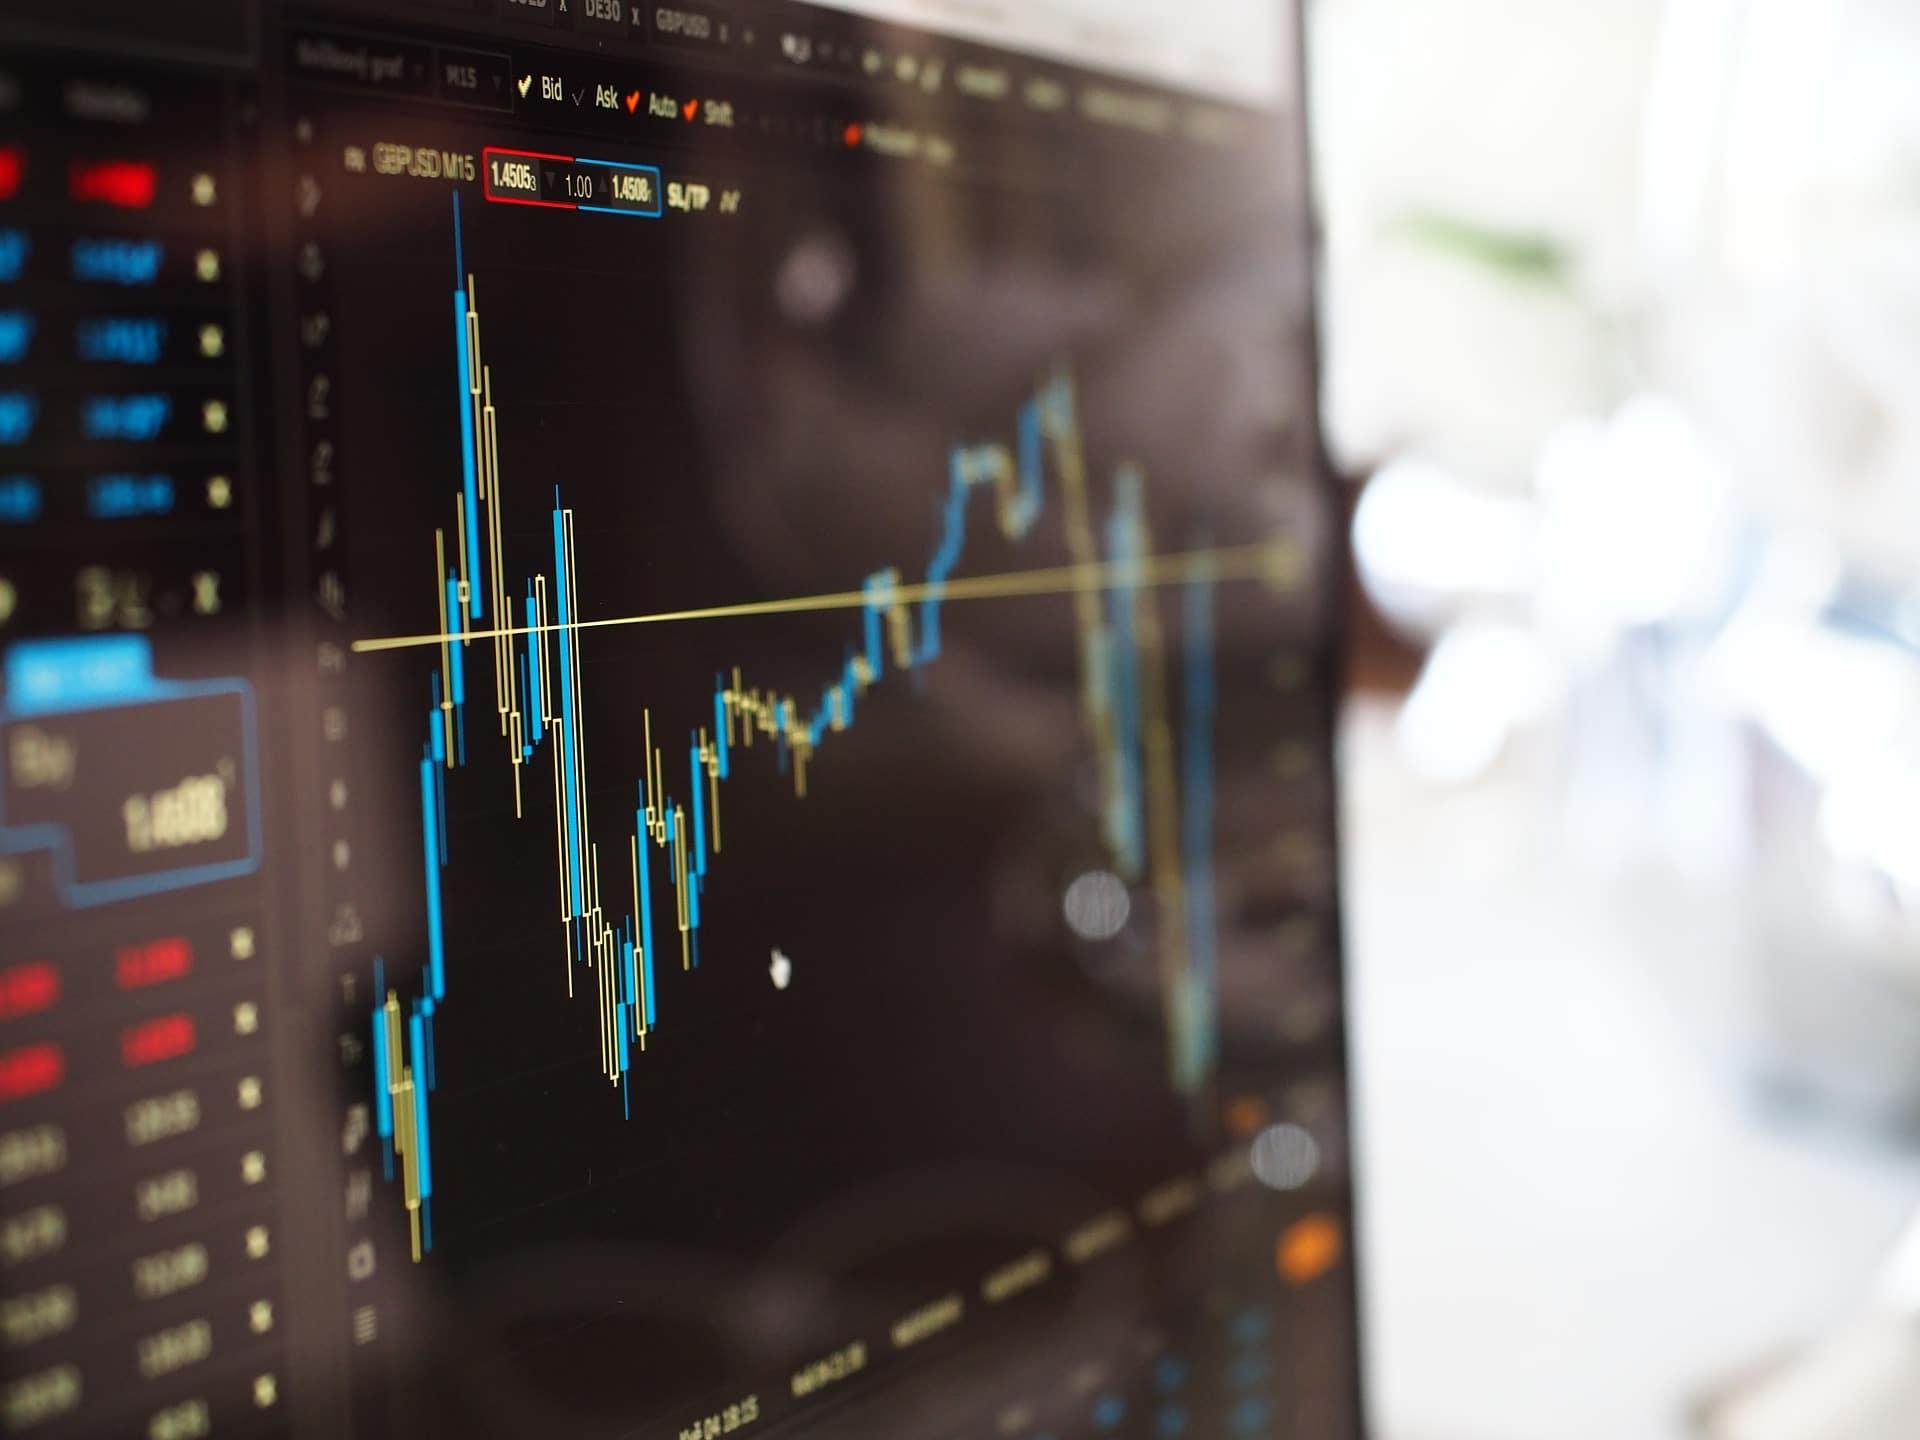 Planspiel Börse